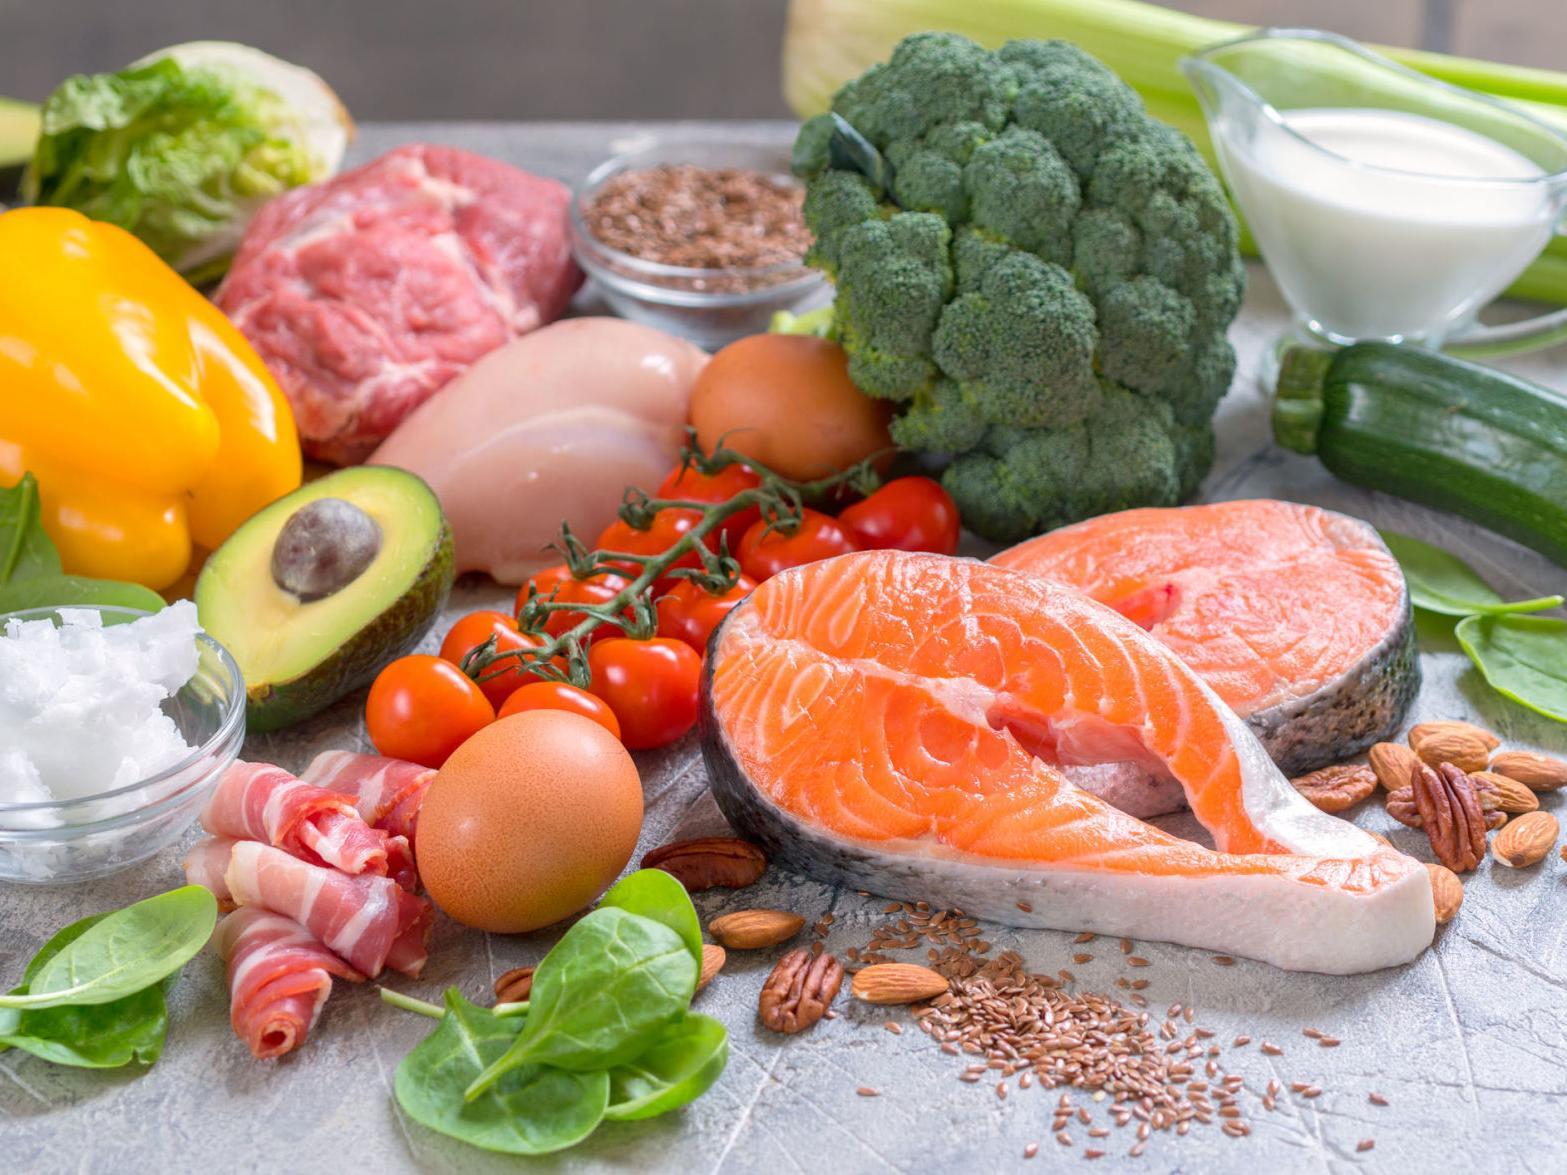 keto diet foods high in fat